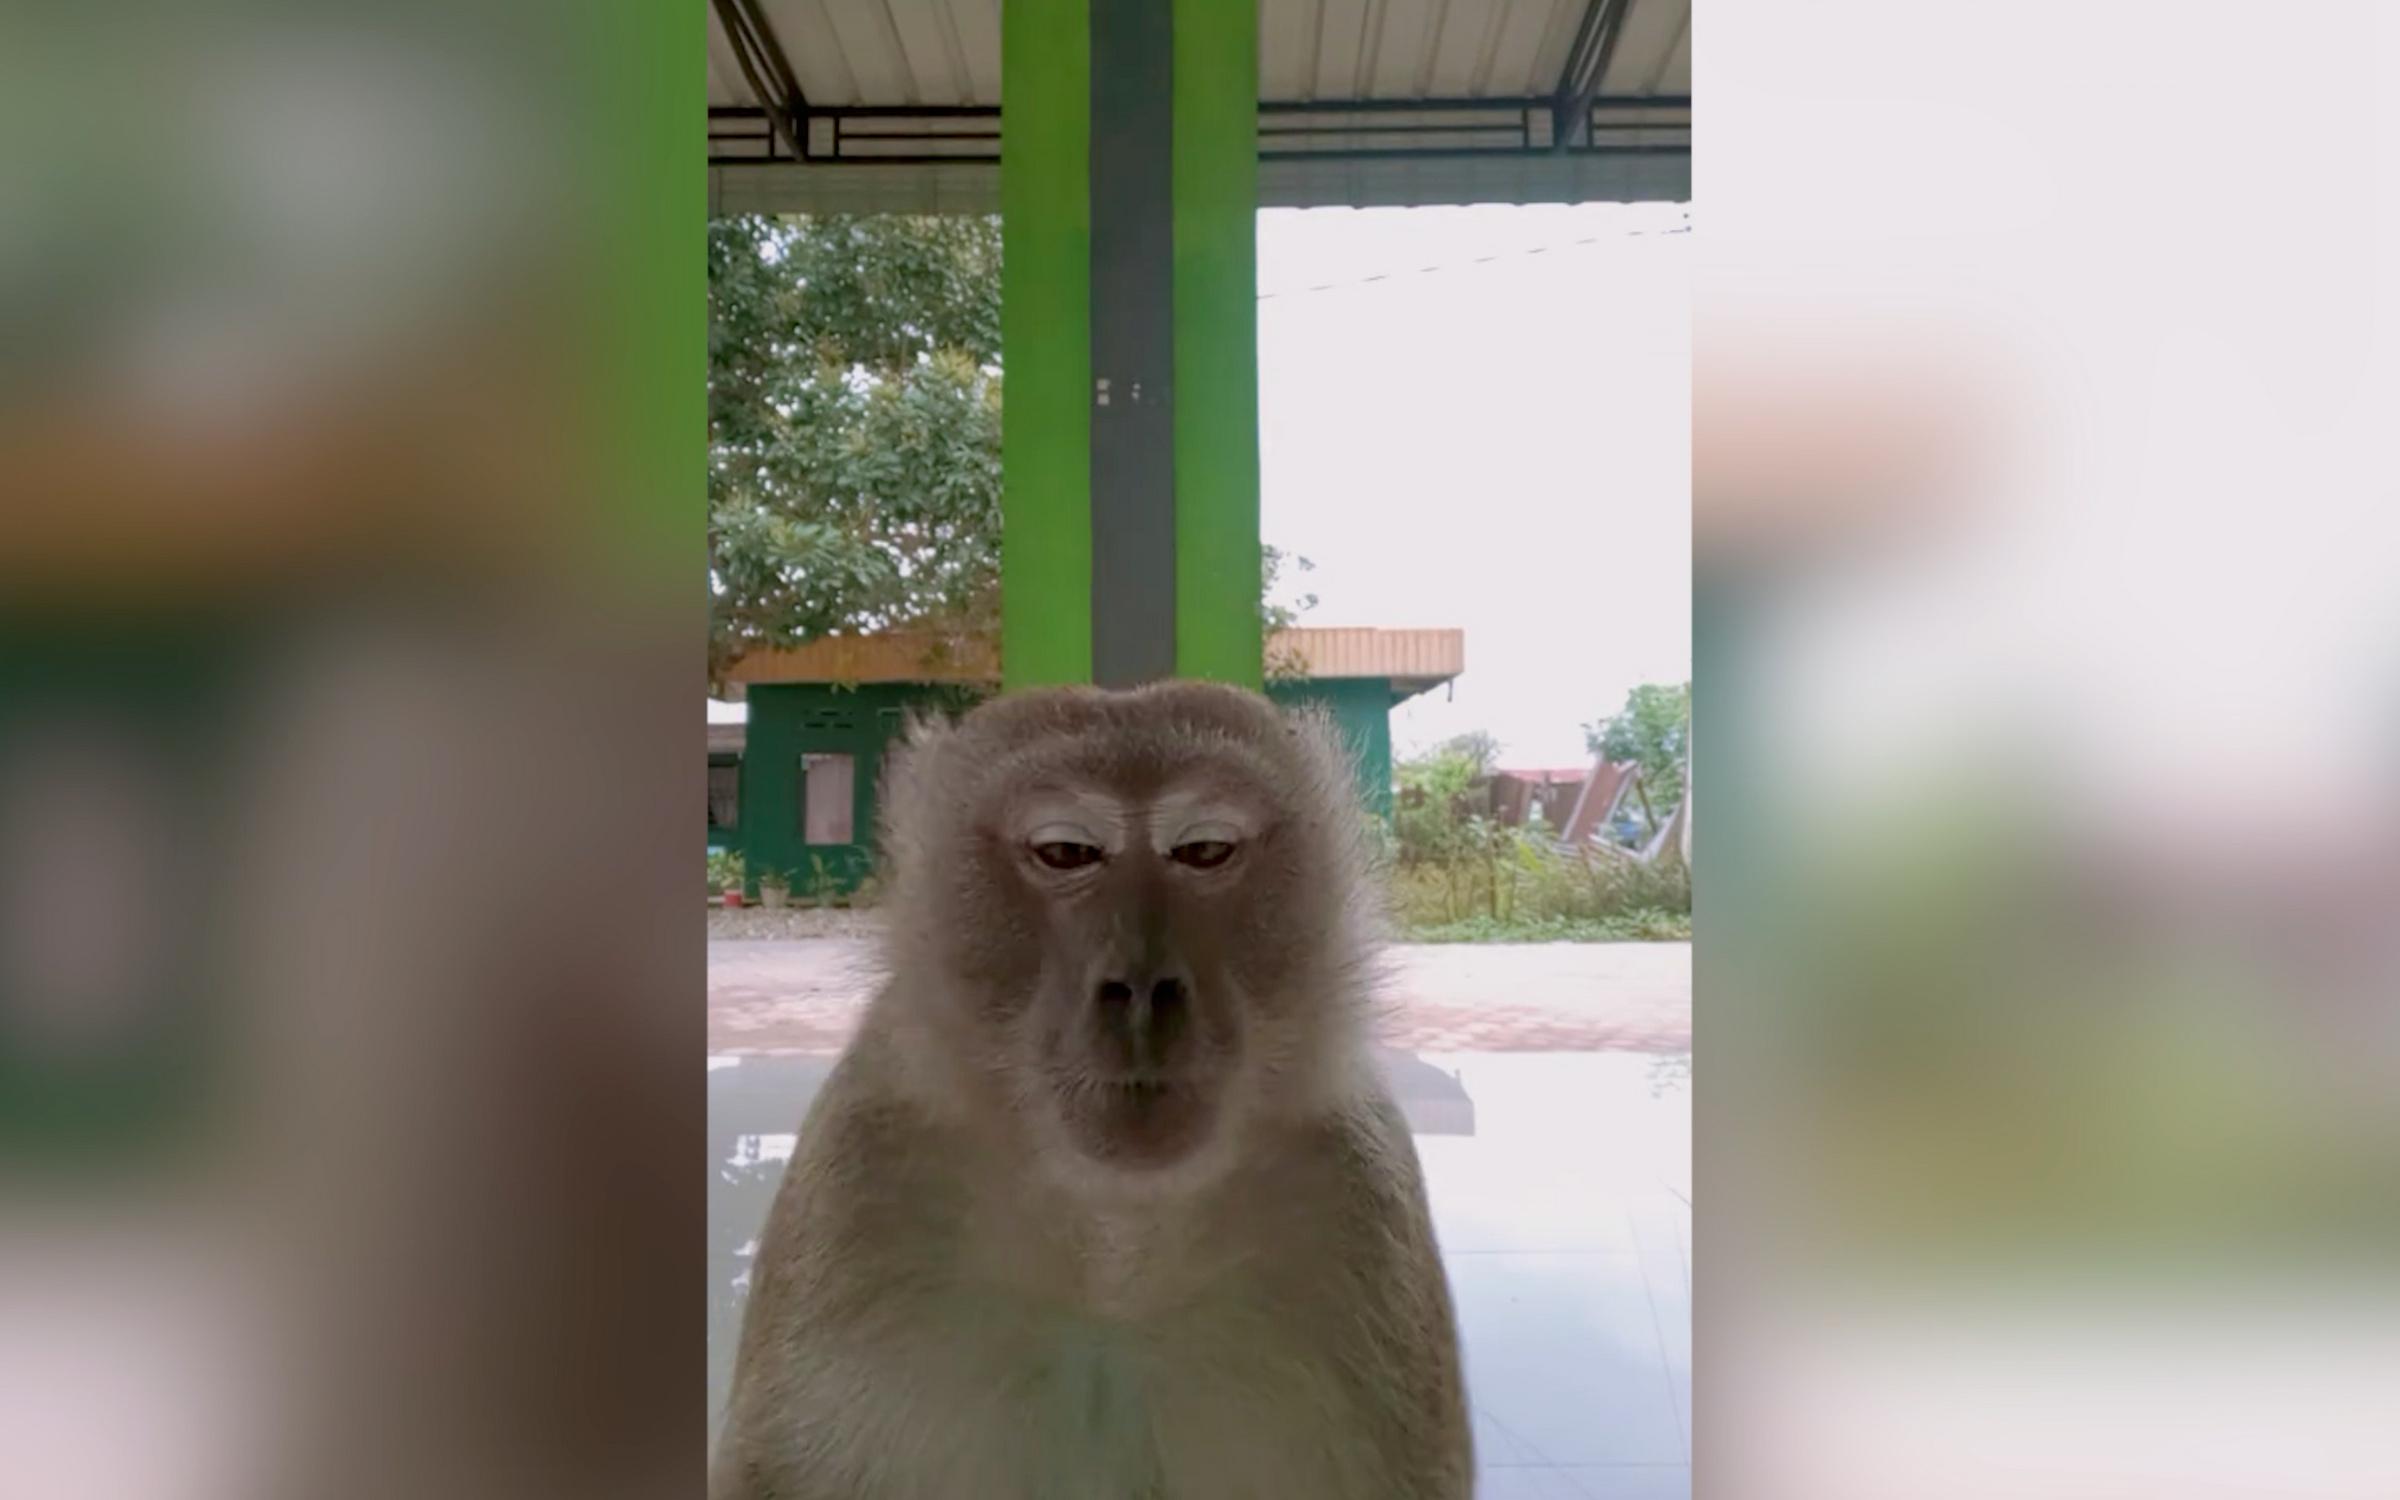 Кадр из видео © TikTok / annisadwiatikah2